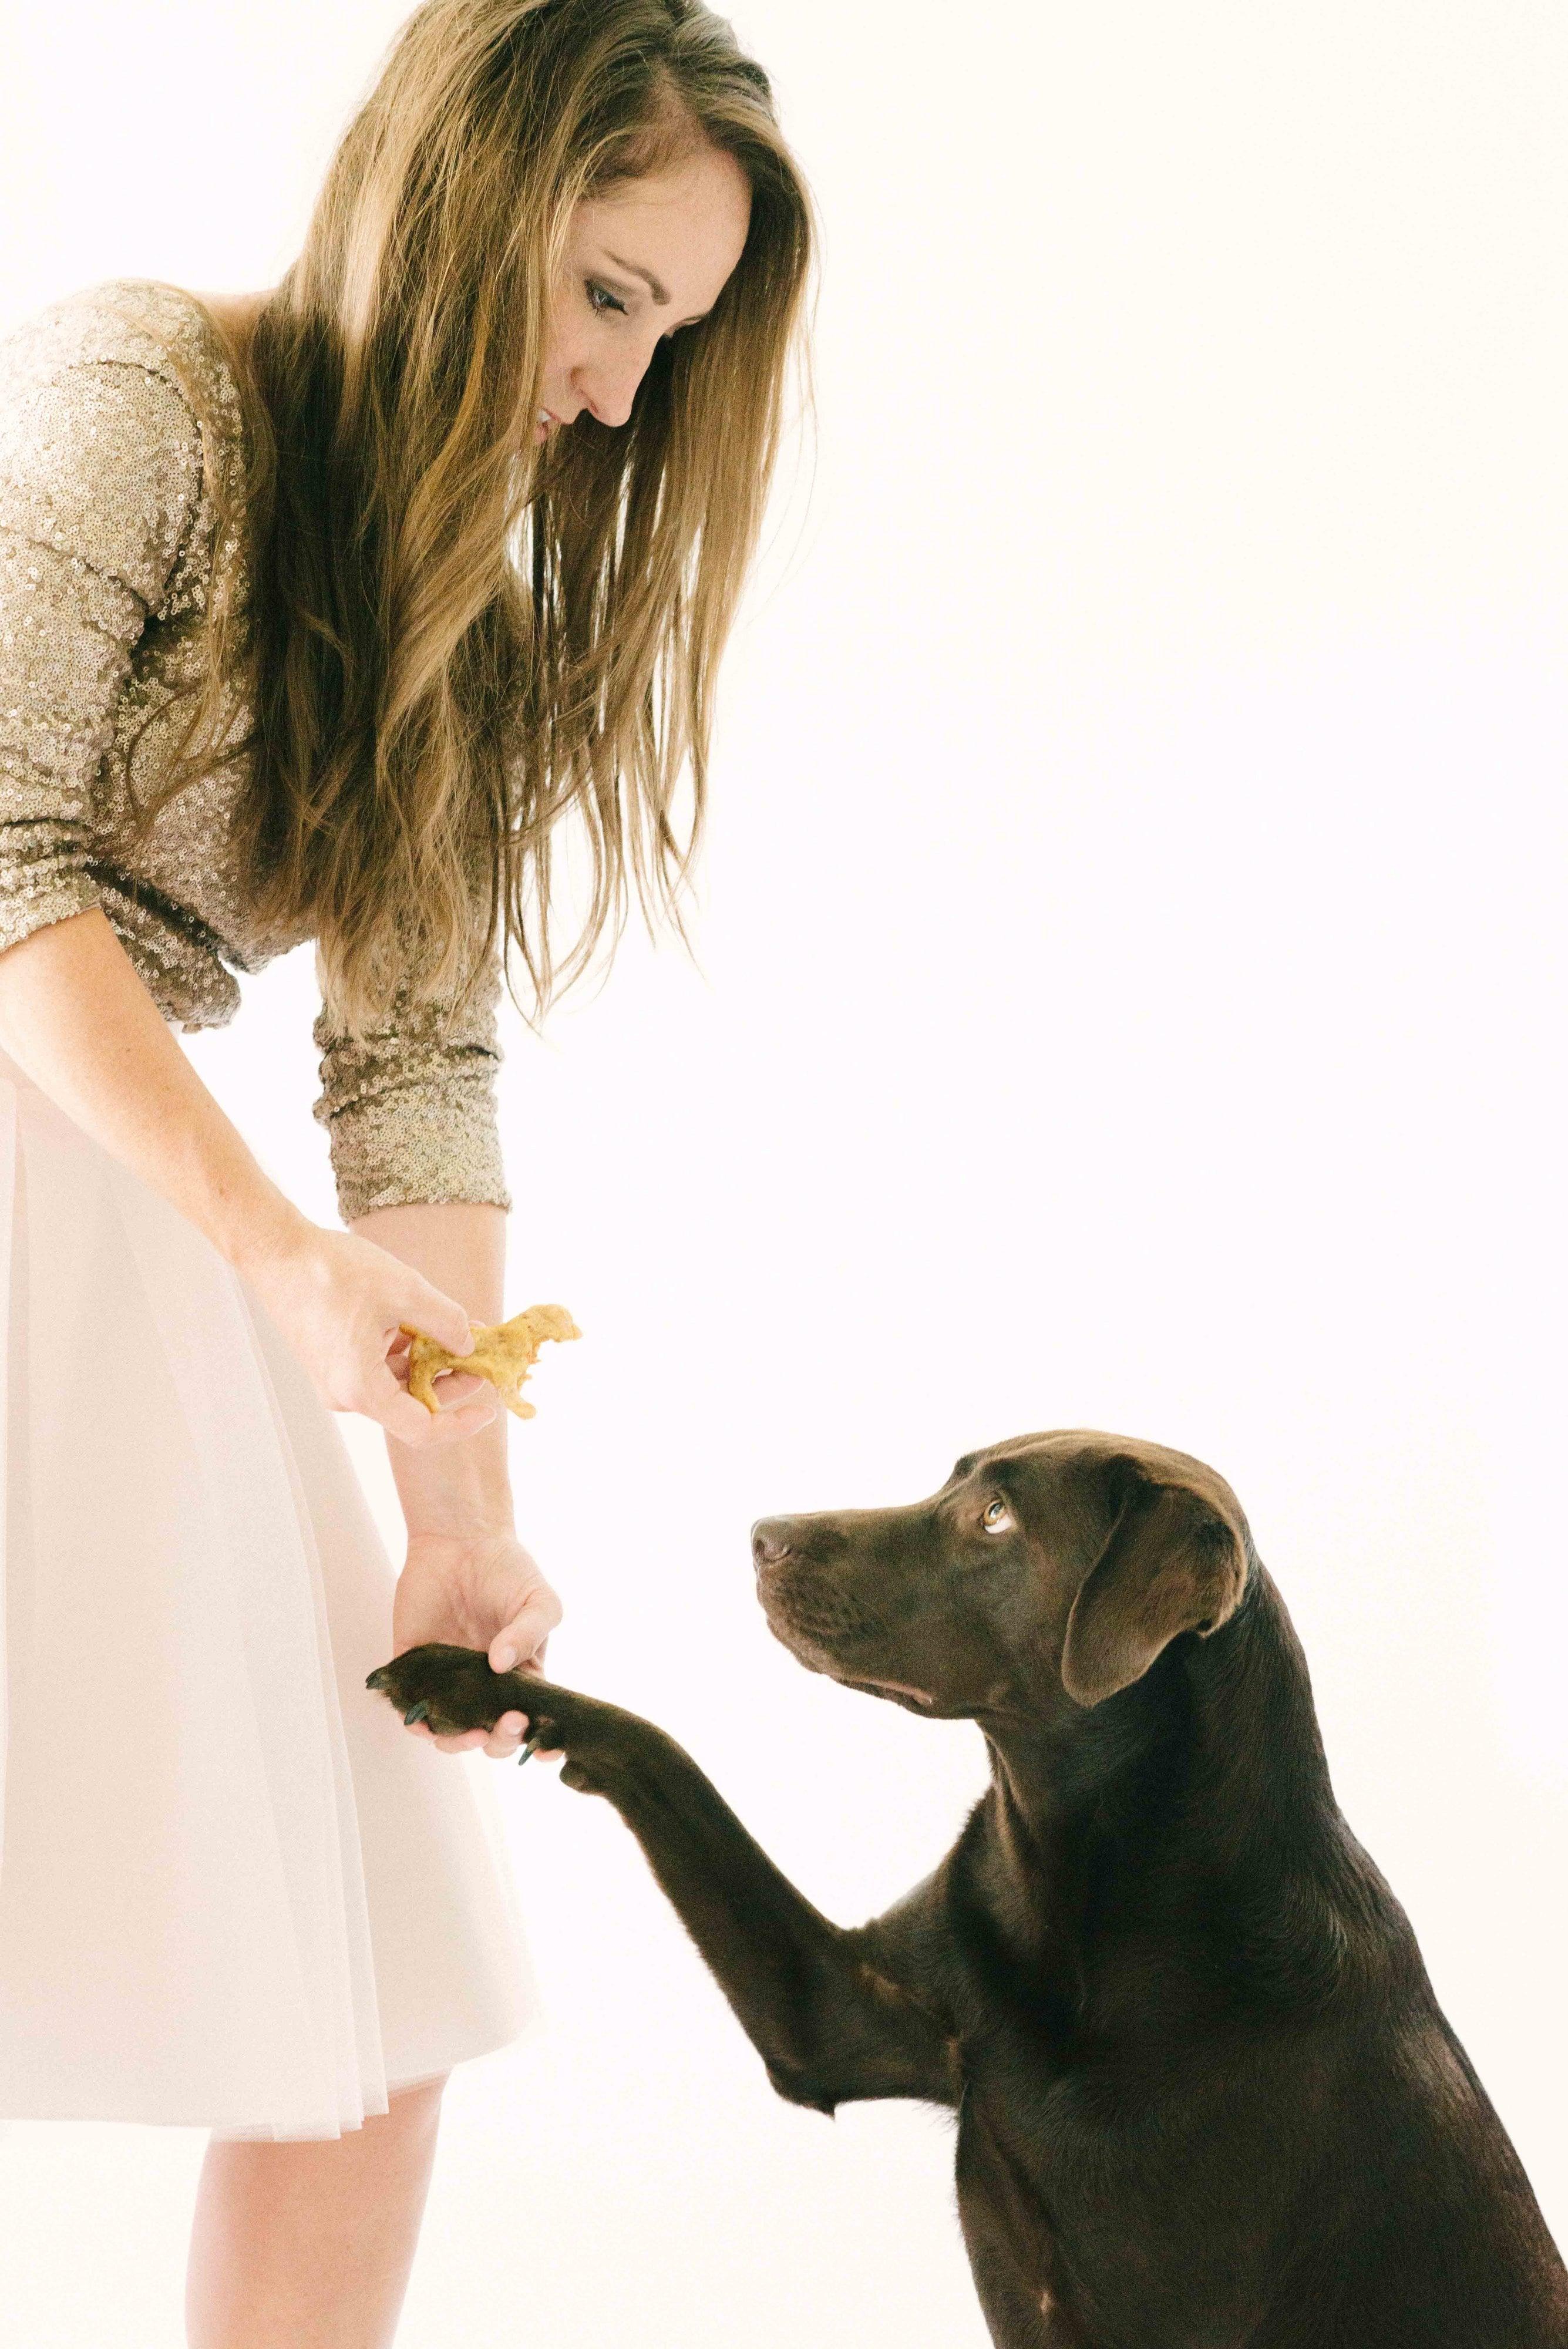 4-Ingredient Dog Treats - Easy Dog Treats - Peanut Butter Dog Treats - Chocolate Labrador Dog Treats - Simple Dog Treats - Homemade Dog Treats - #pets #DIY